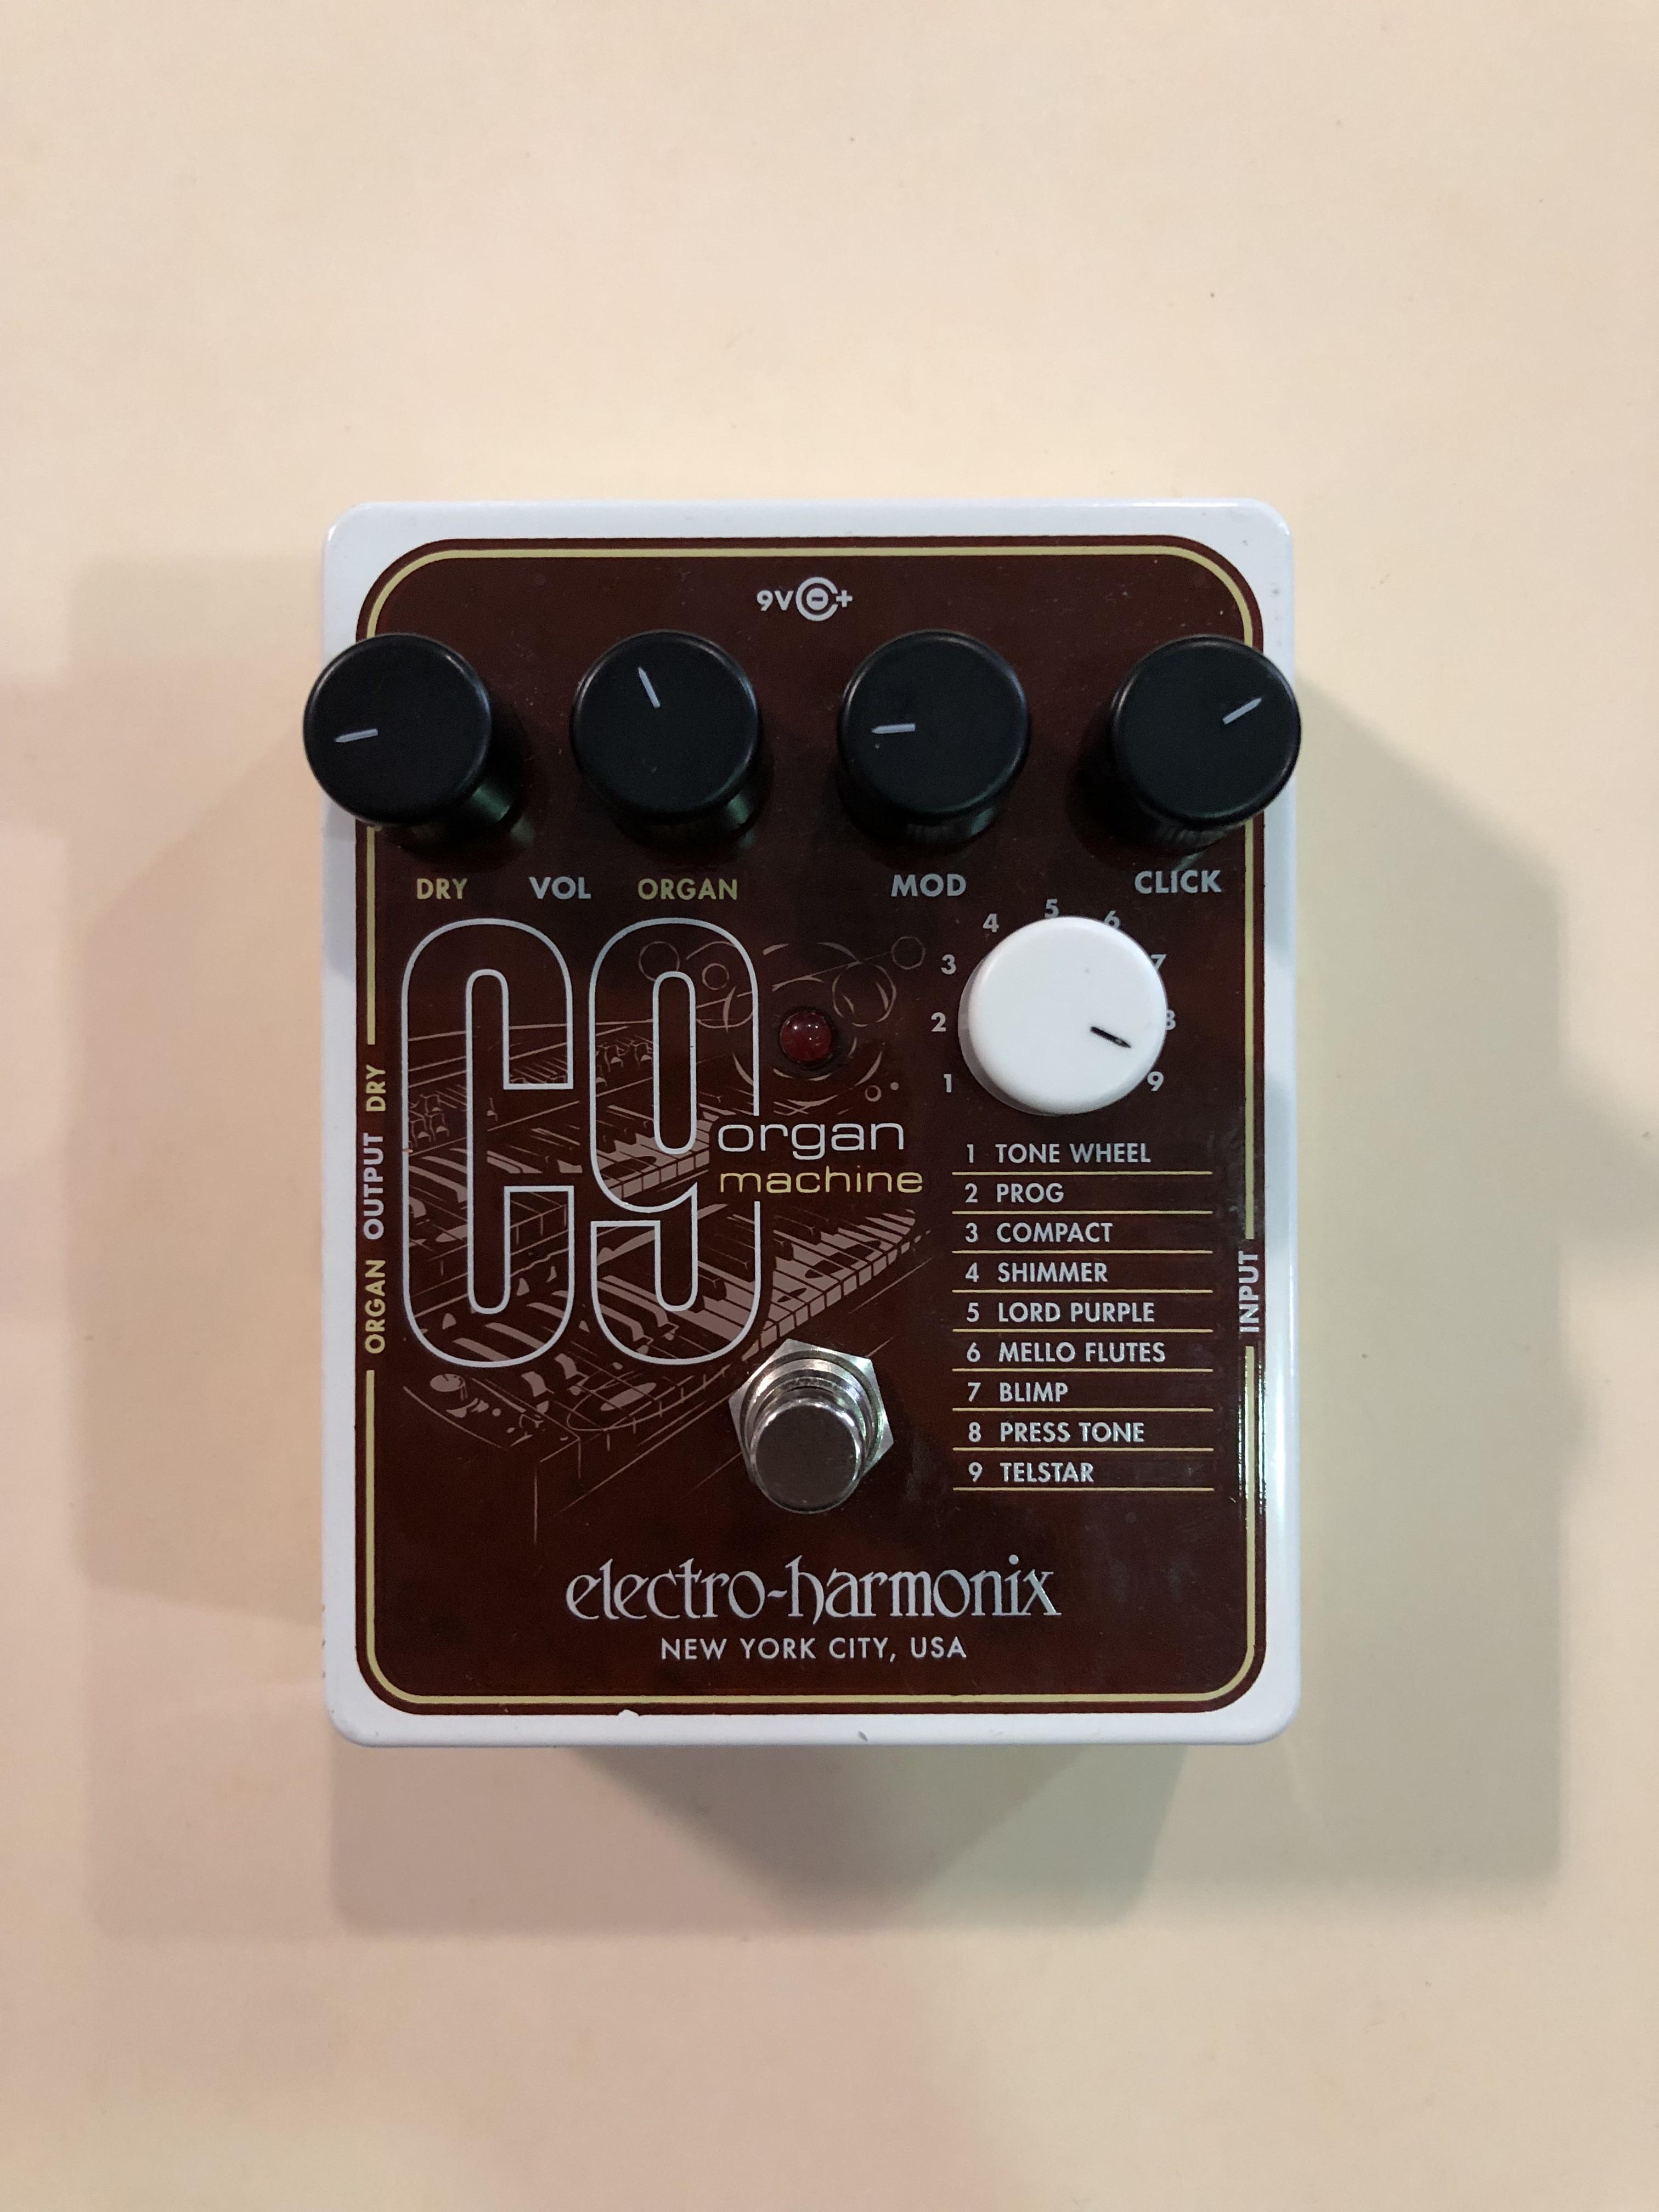 ELECTRO-HARMONIX - C9 ORGAN MACHINE - EFFECTS PEDAL